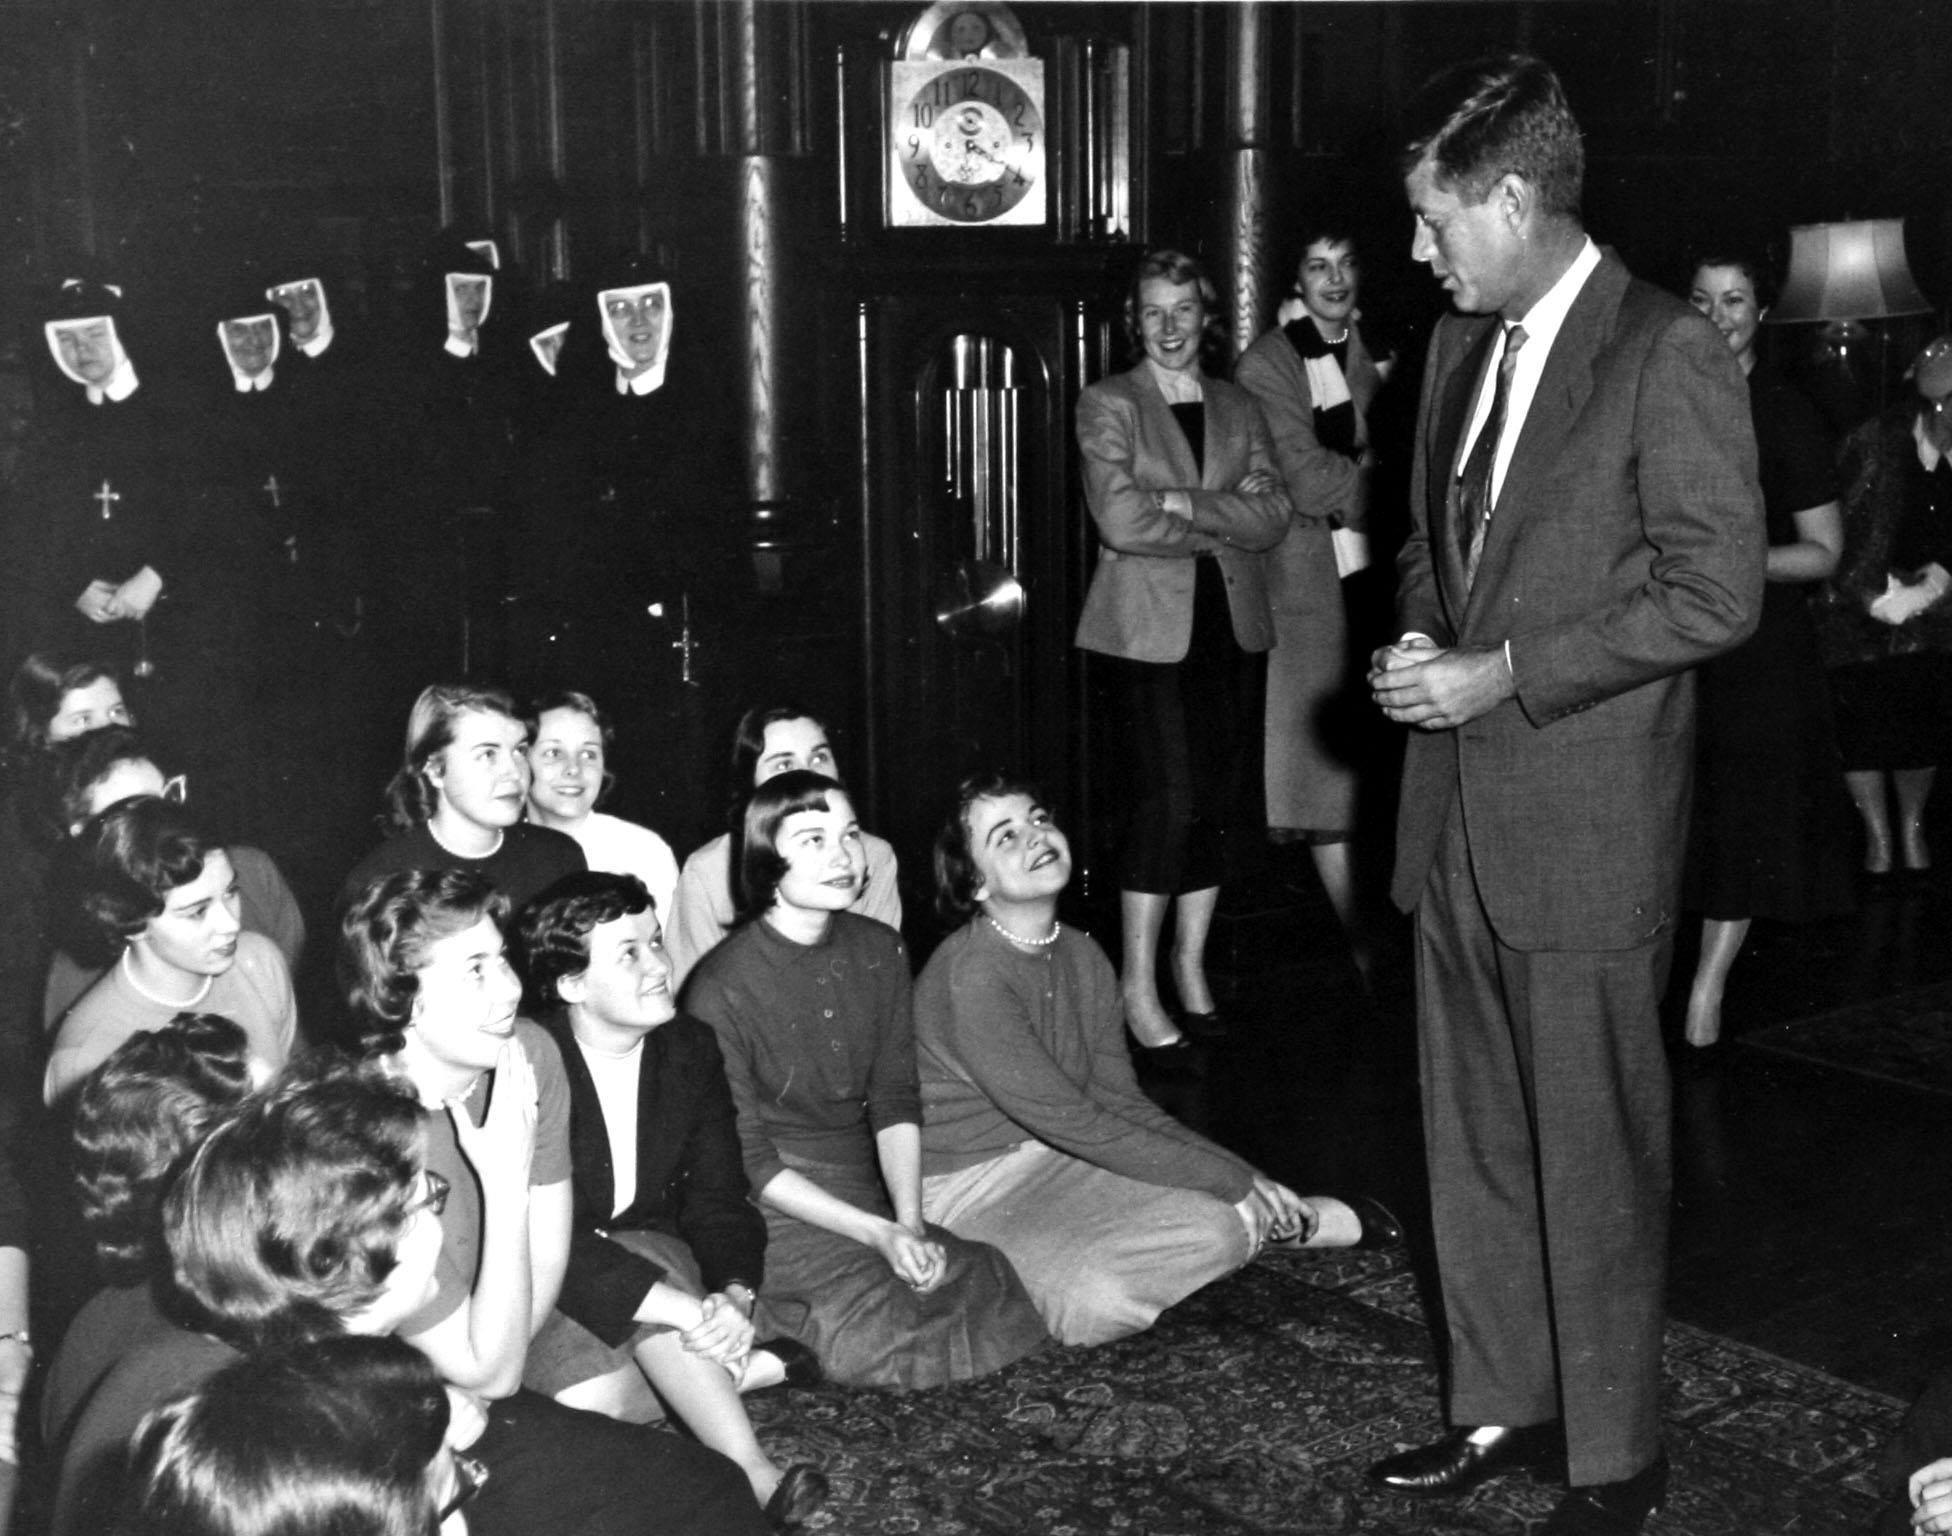 Senator John F. Kennedy visits Rosemont, 1957